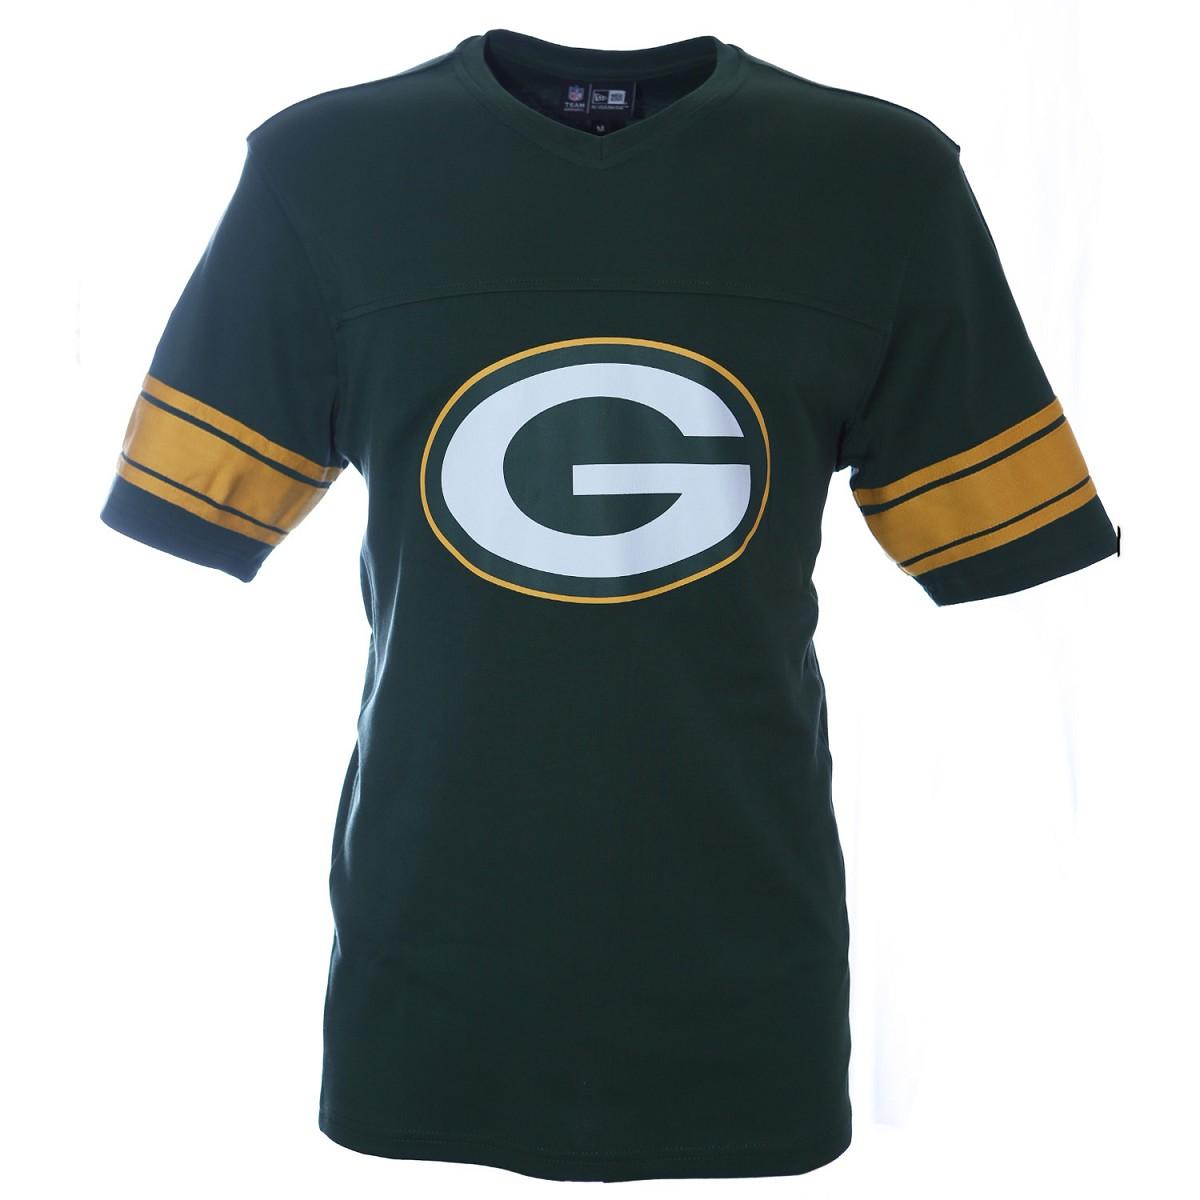 Tshirt New Era Sb50 Nfl V Neck Green Bay Packers Jerseys